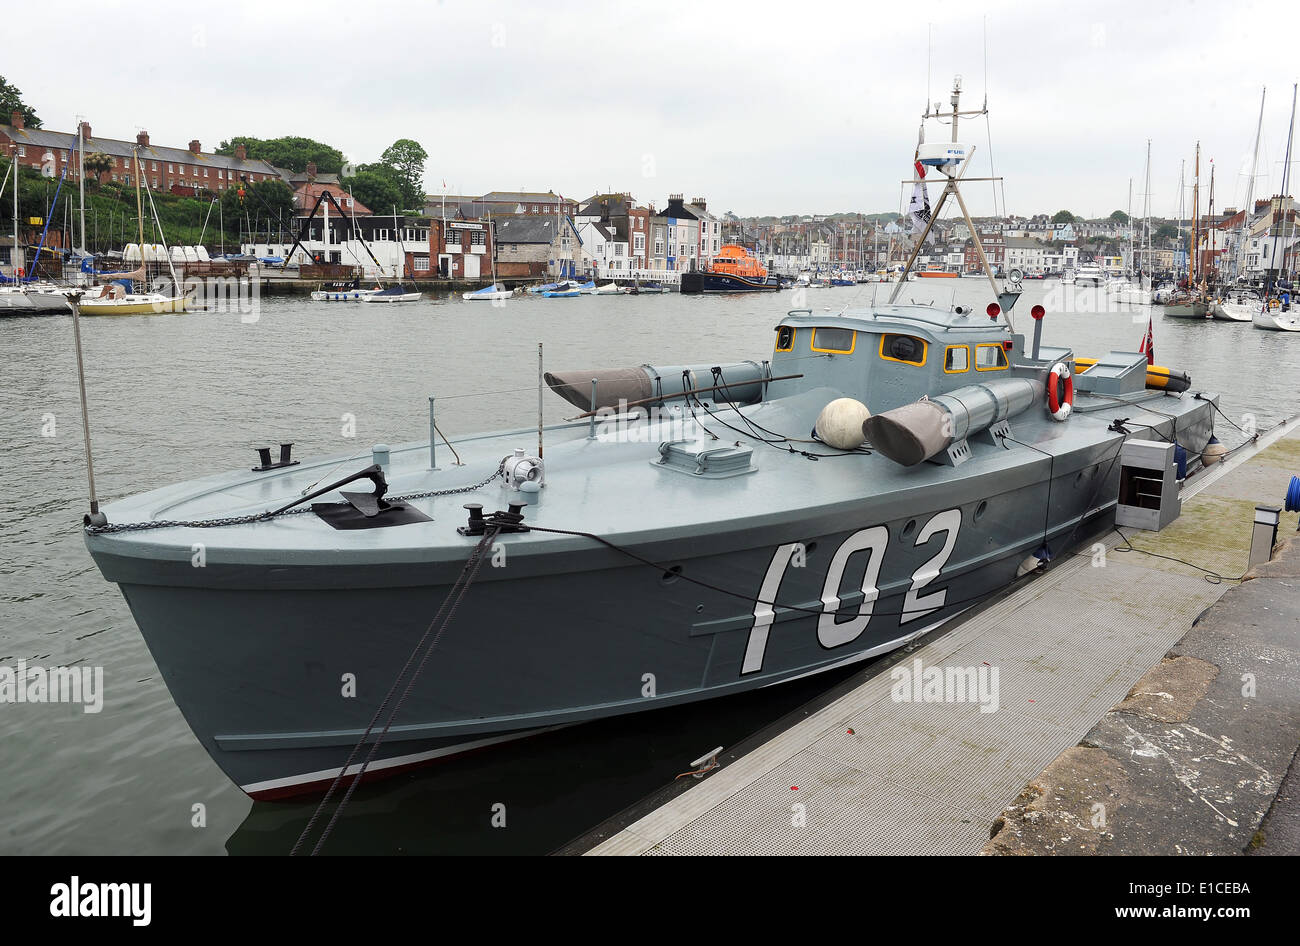 Motor Torpedo Boat, MTB-102, World War 2 Motor Torpedo Boat Stock Photo